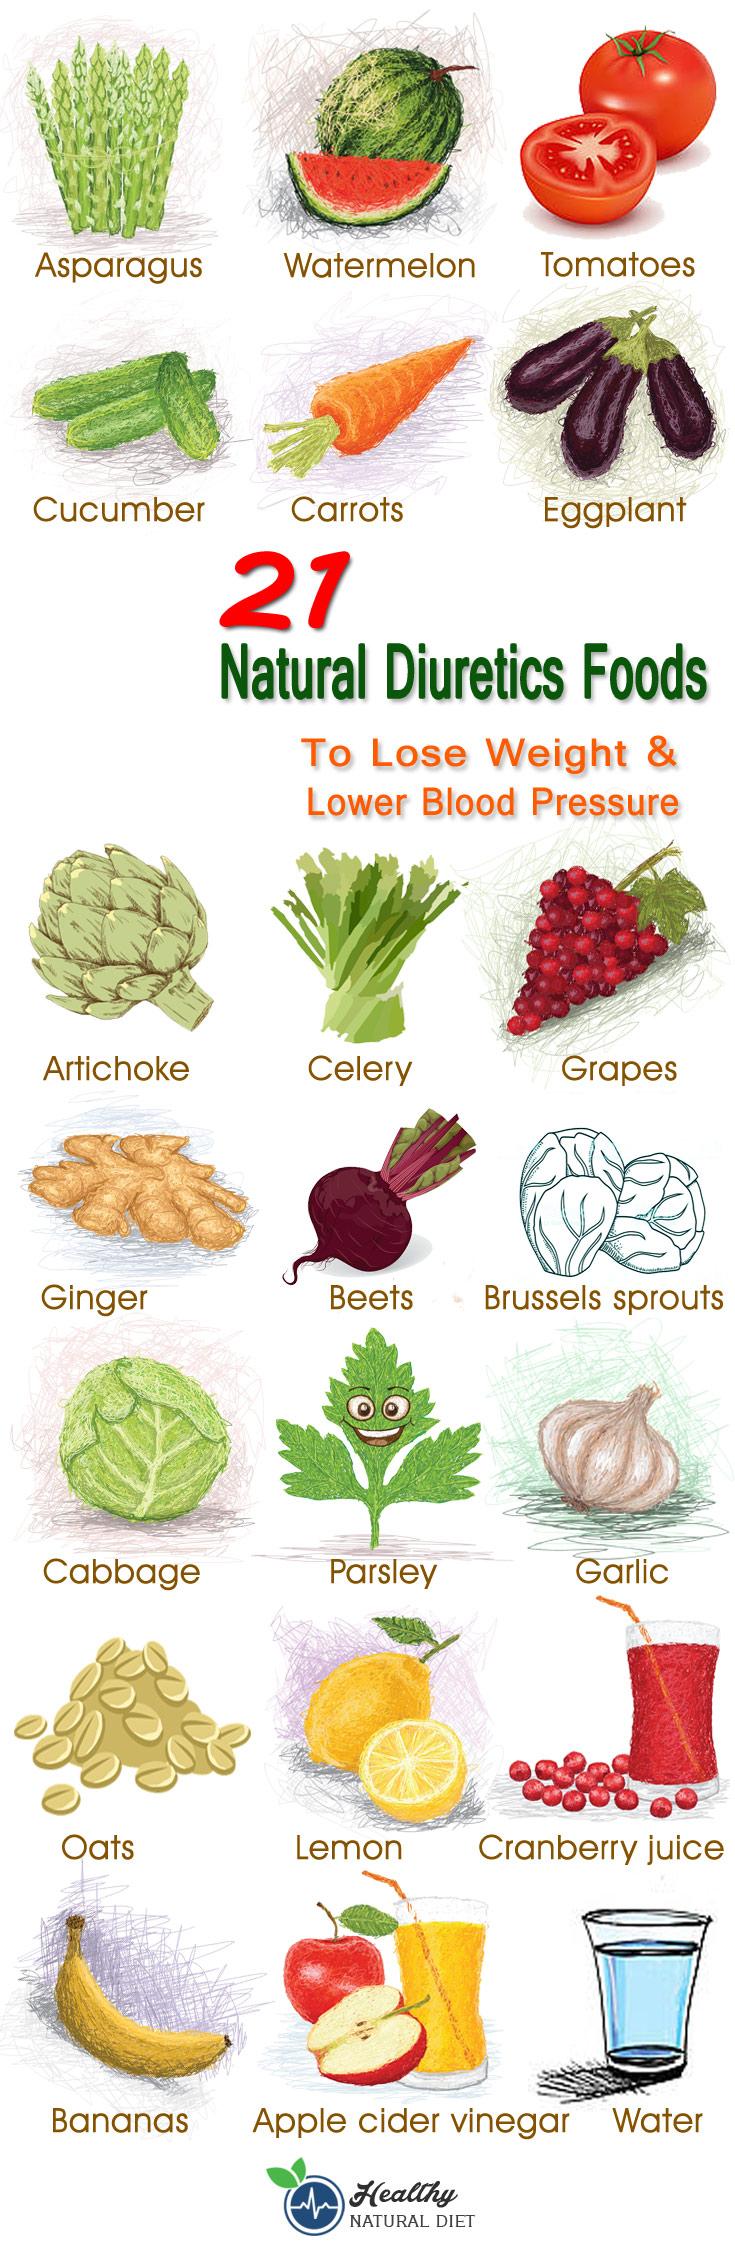 21 Natural Diuretics Foods